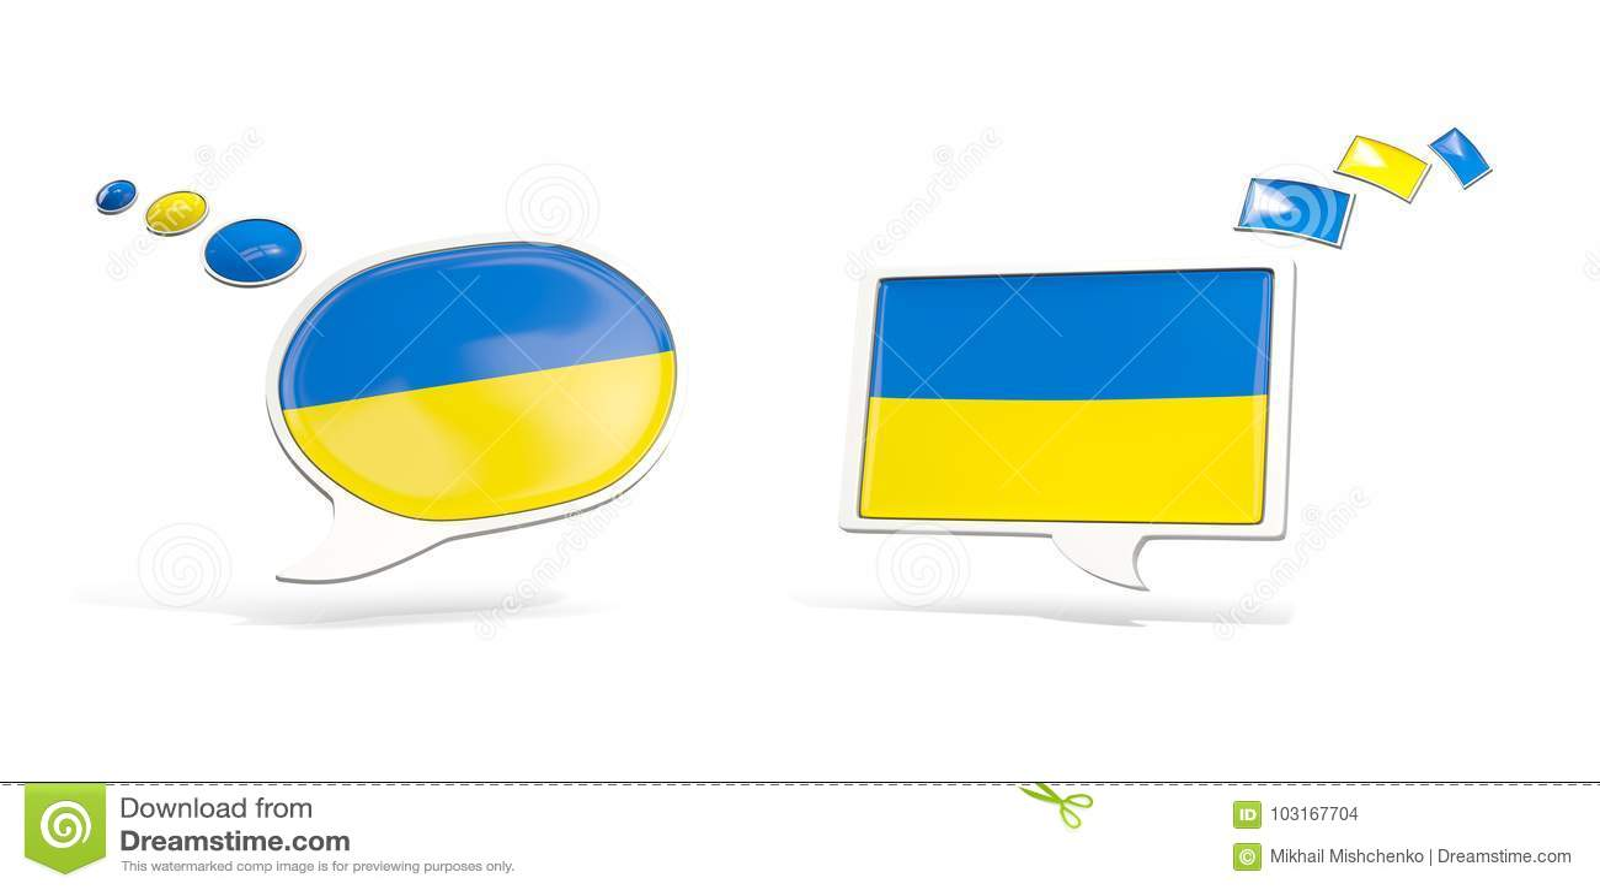 Ukraina chat chat